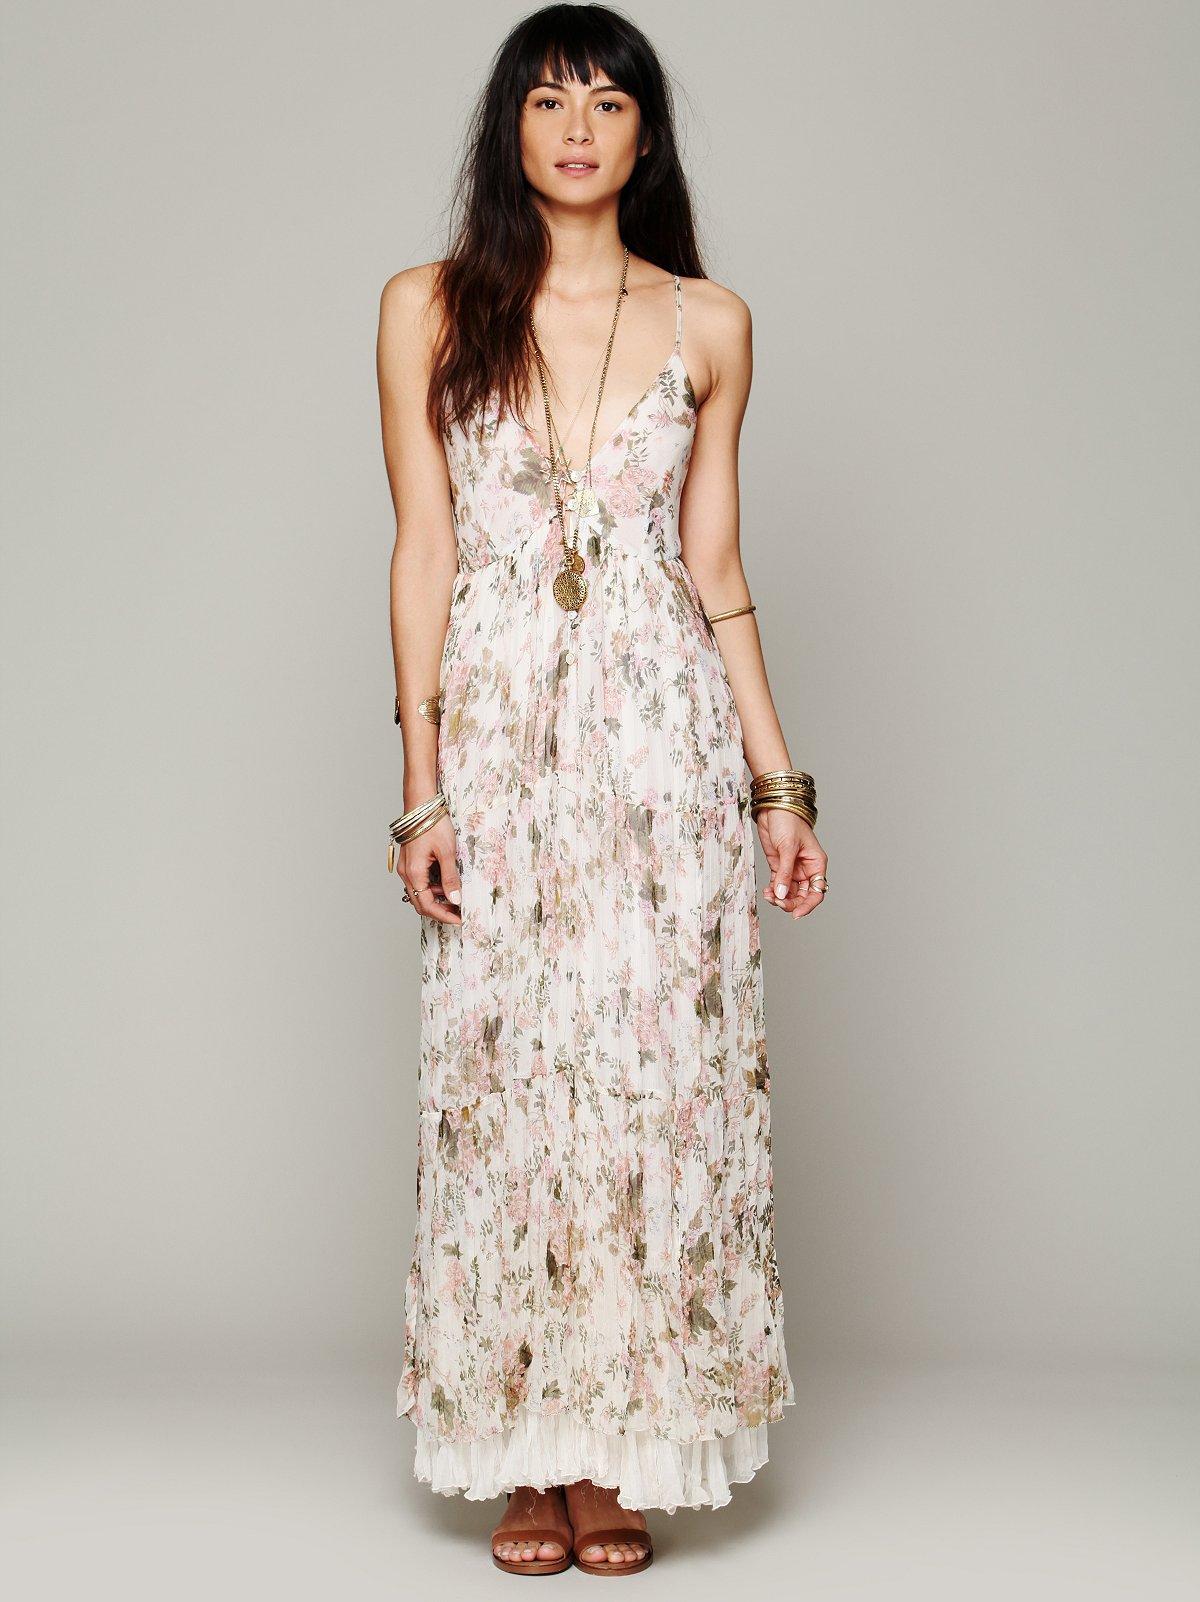 Heidi Printed Floral Dress